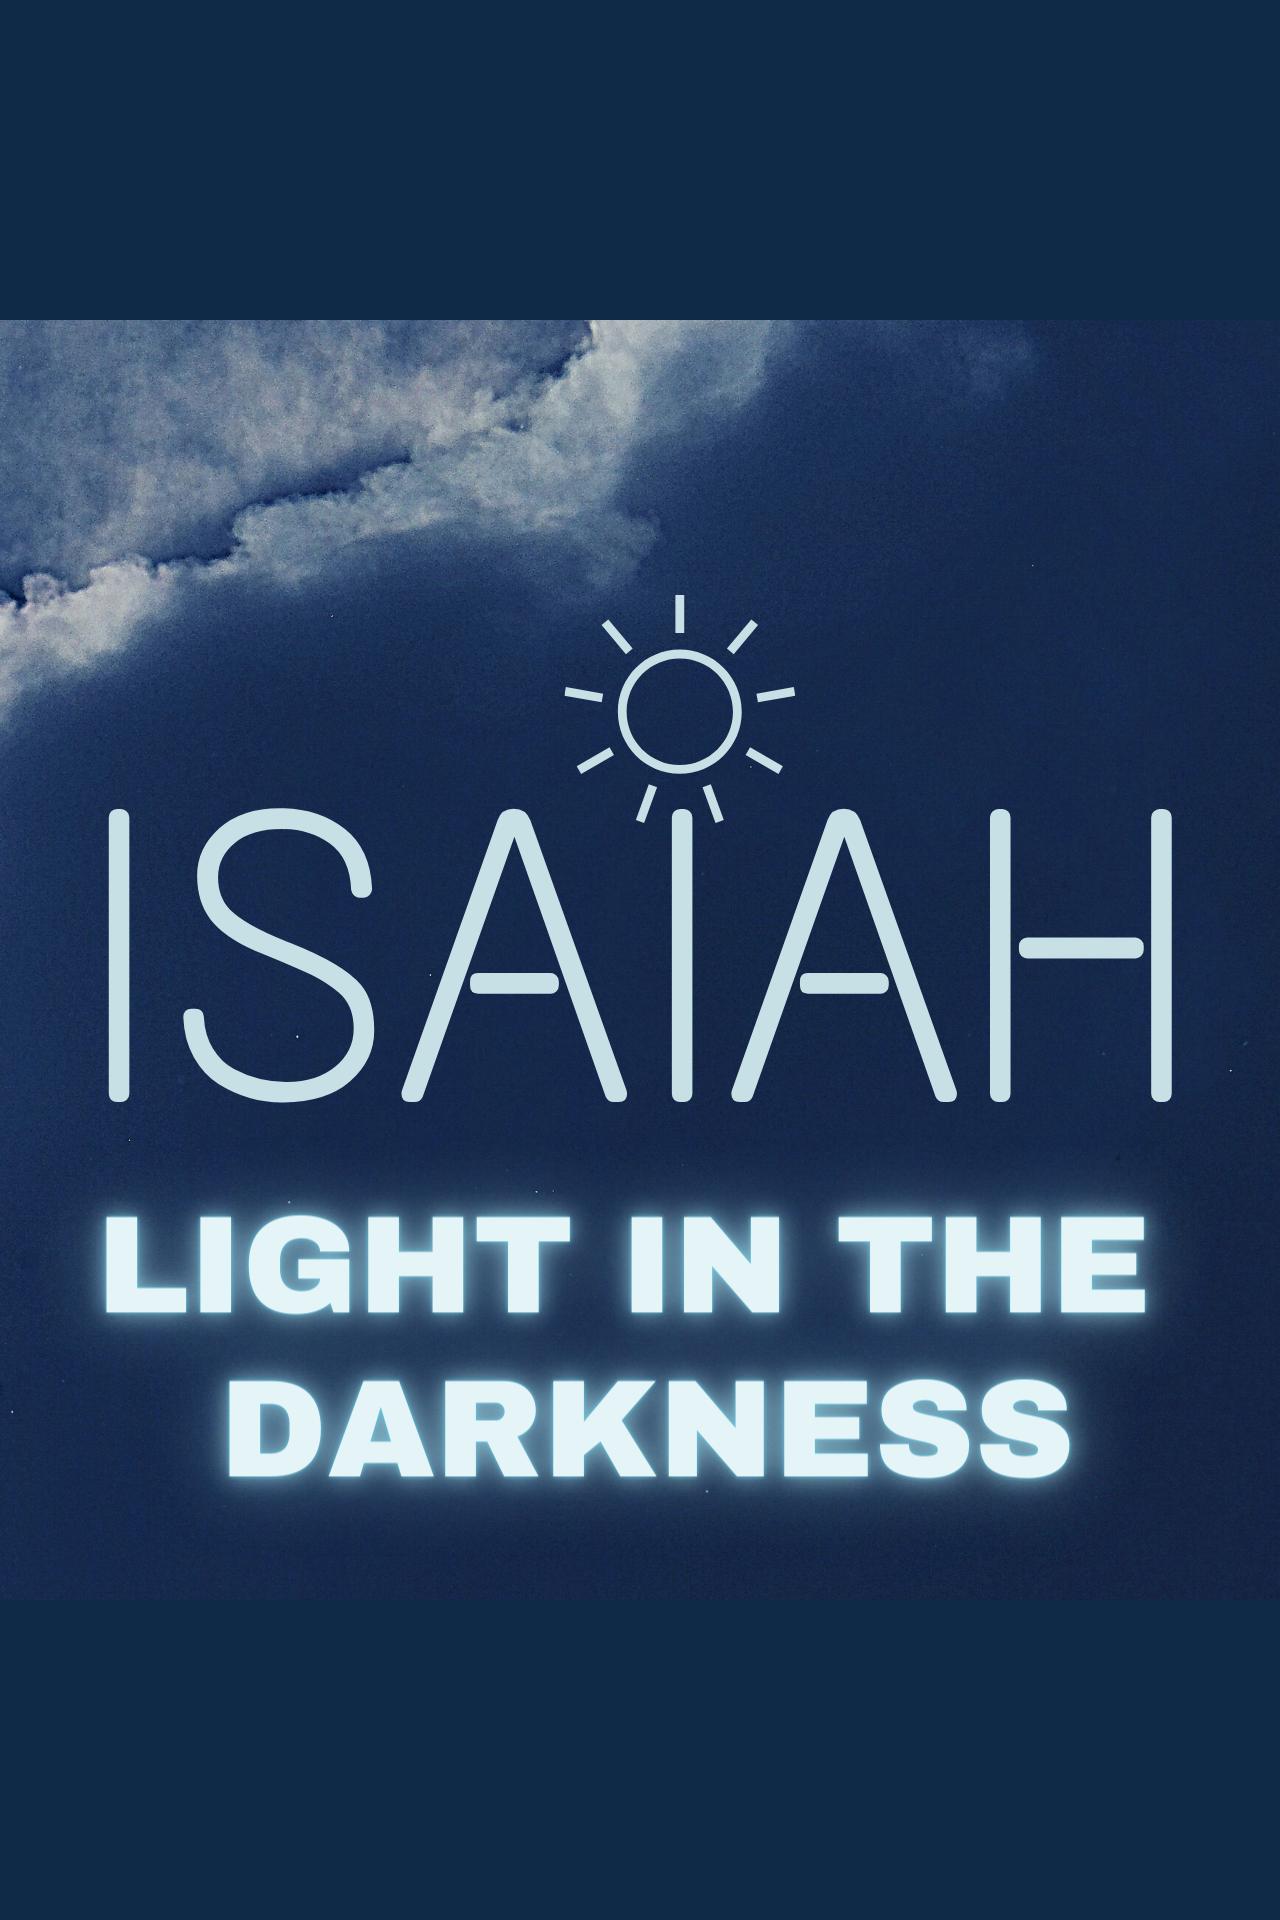 Isaiah 24-27